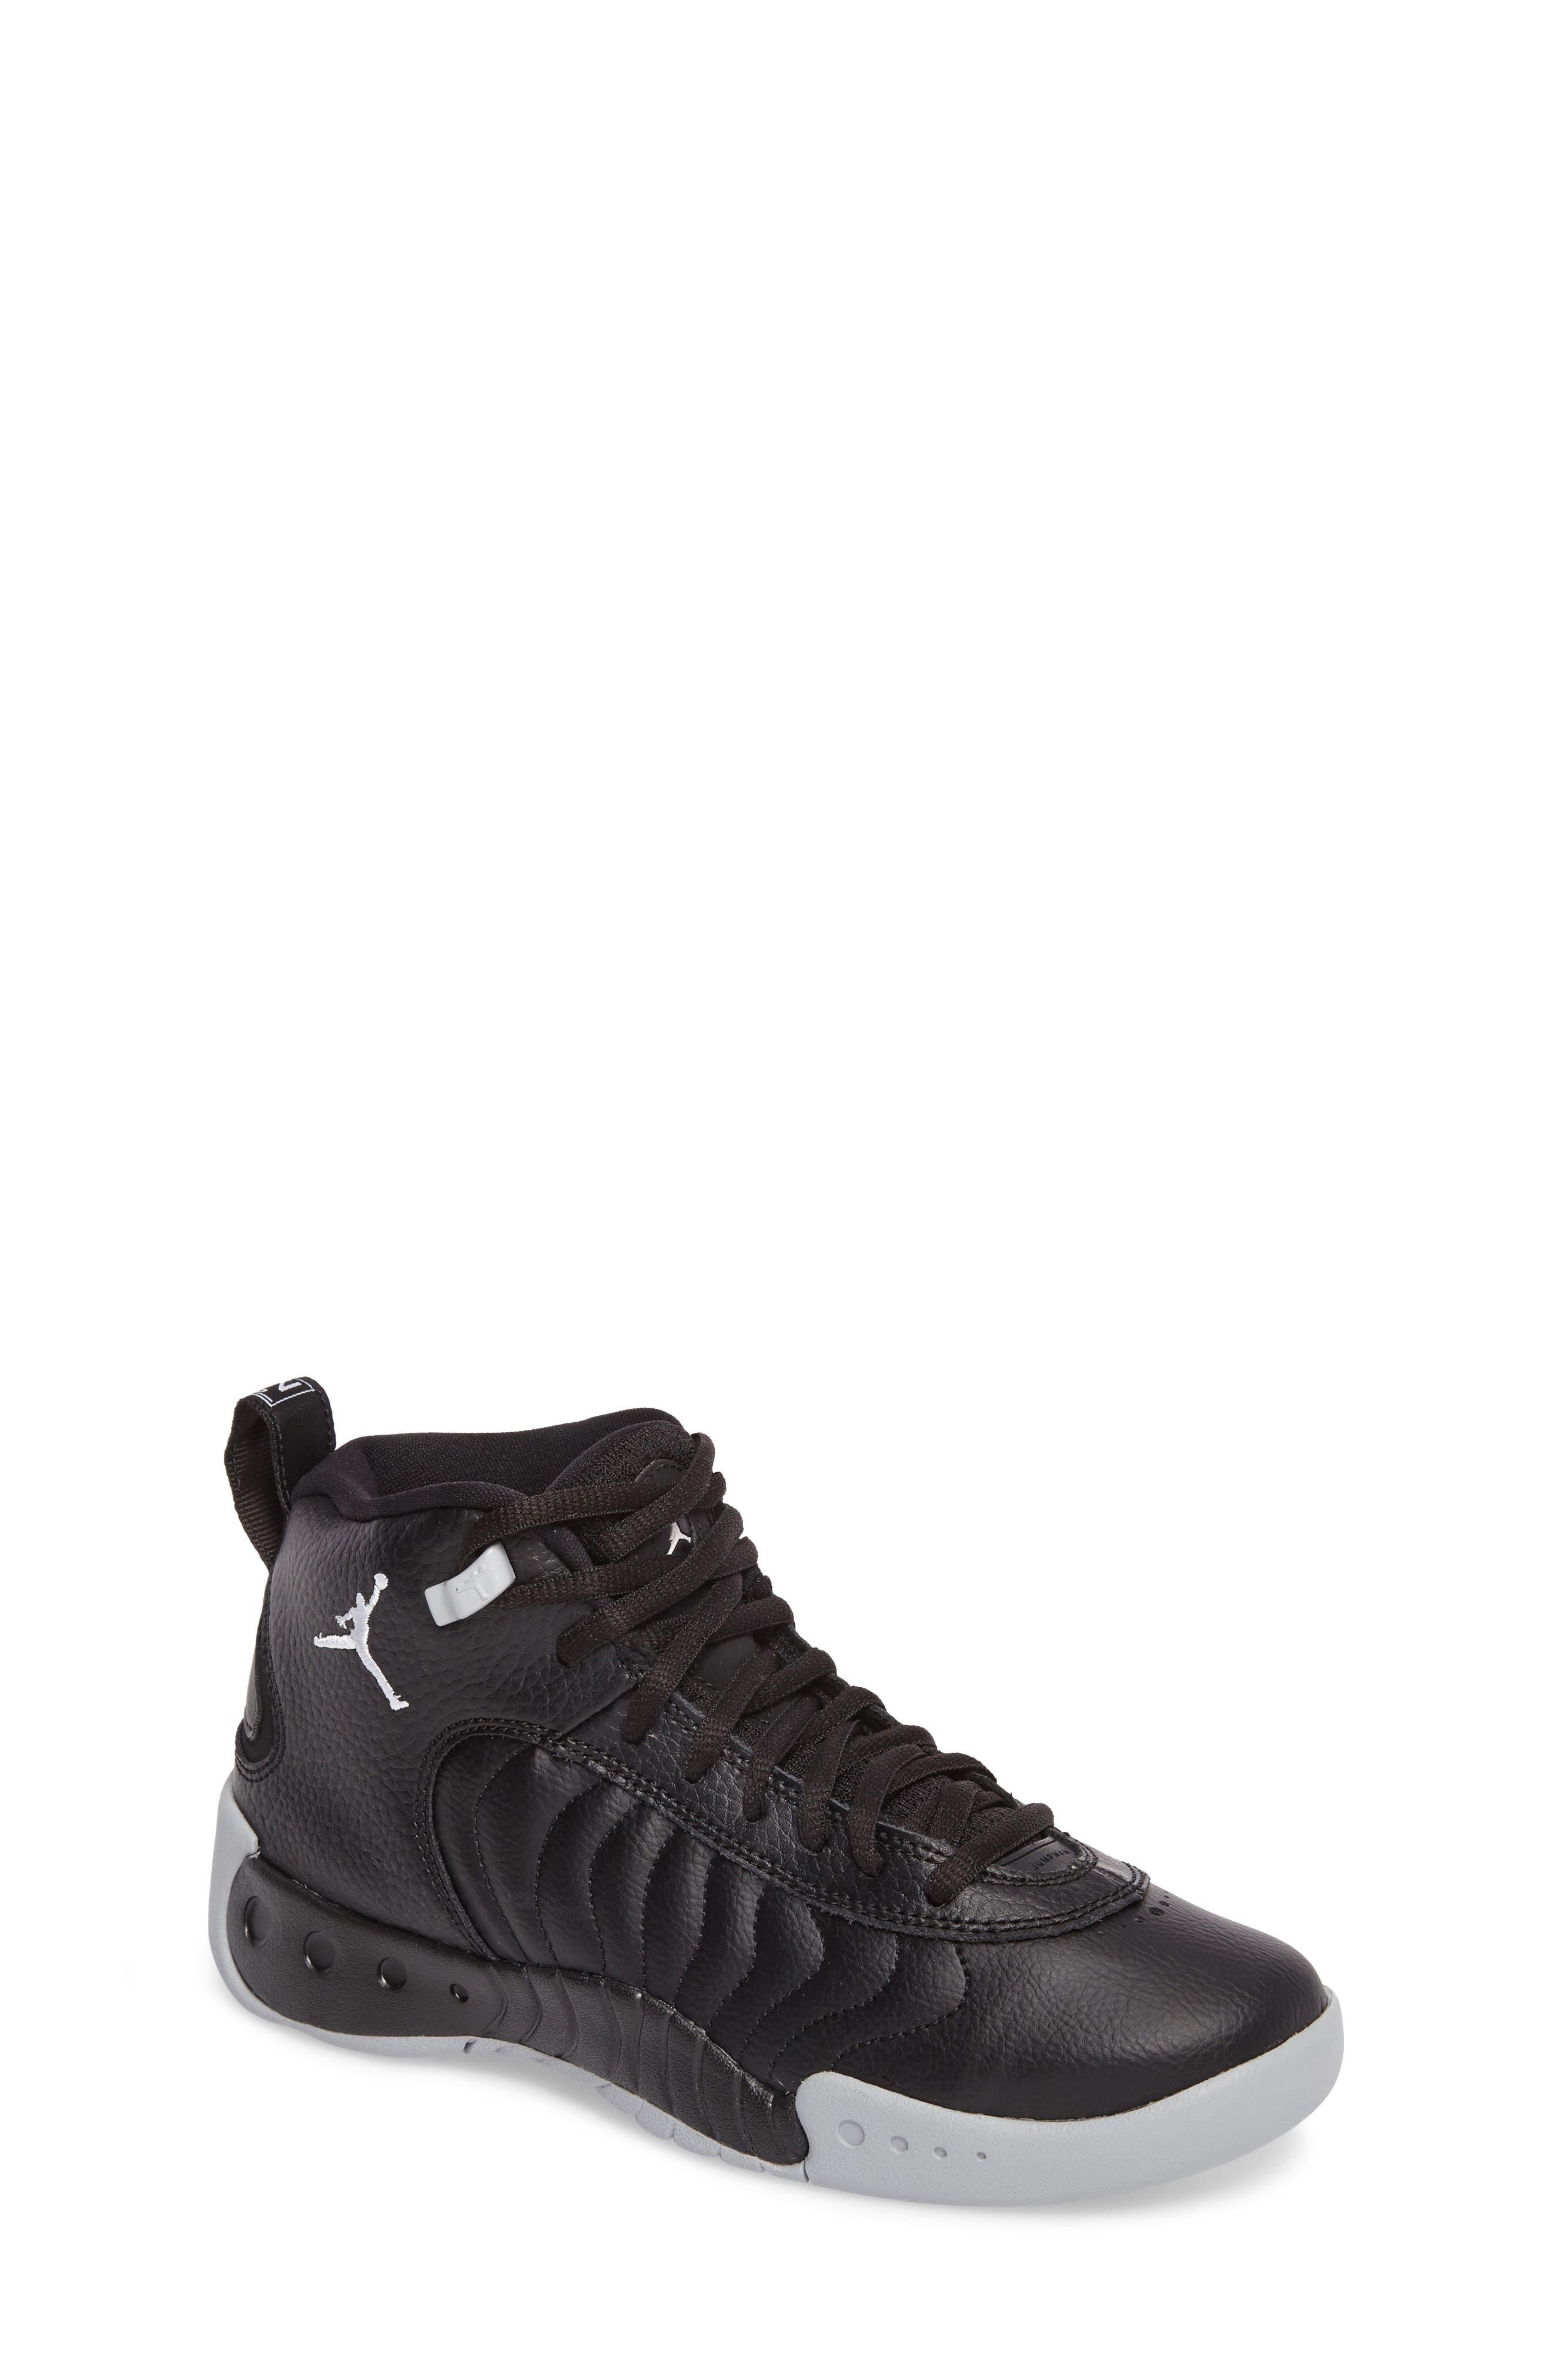 Jumpman Pro BG Mid Top Sneaker,                         Main,                         color, 012